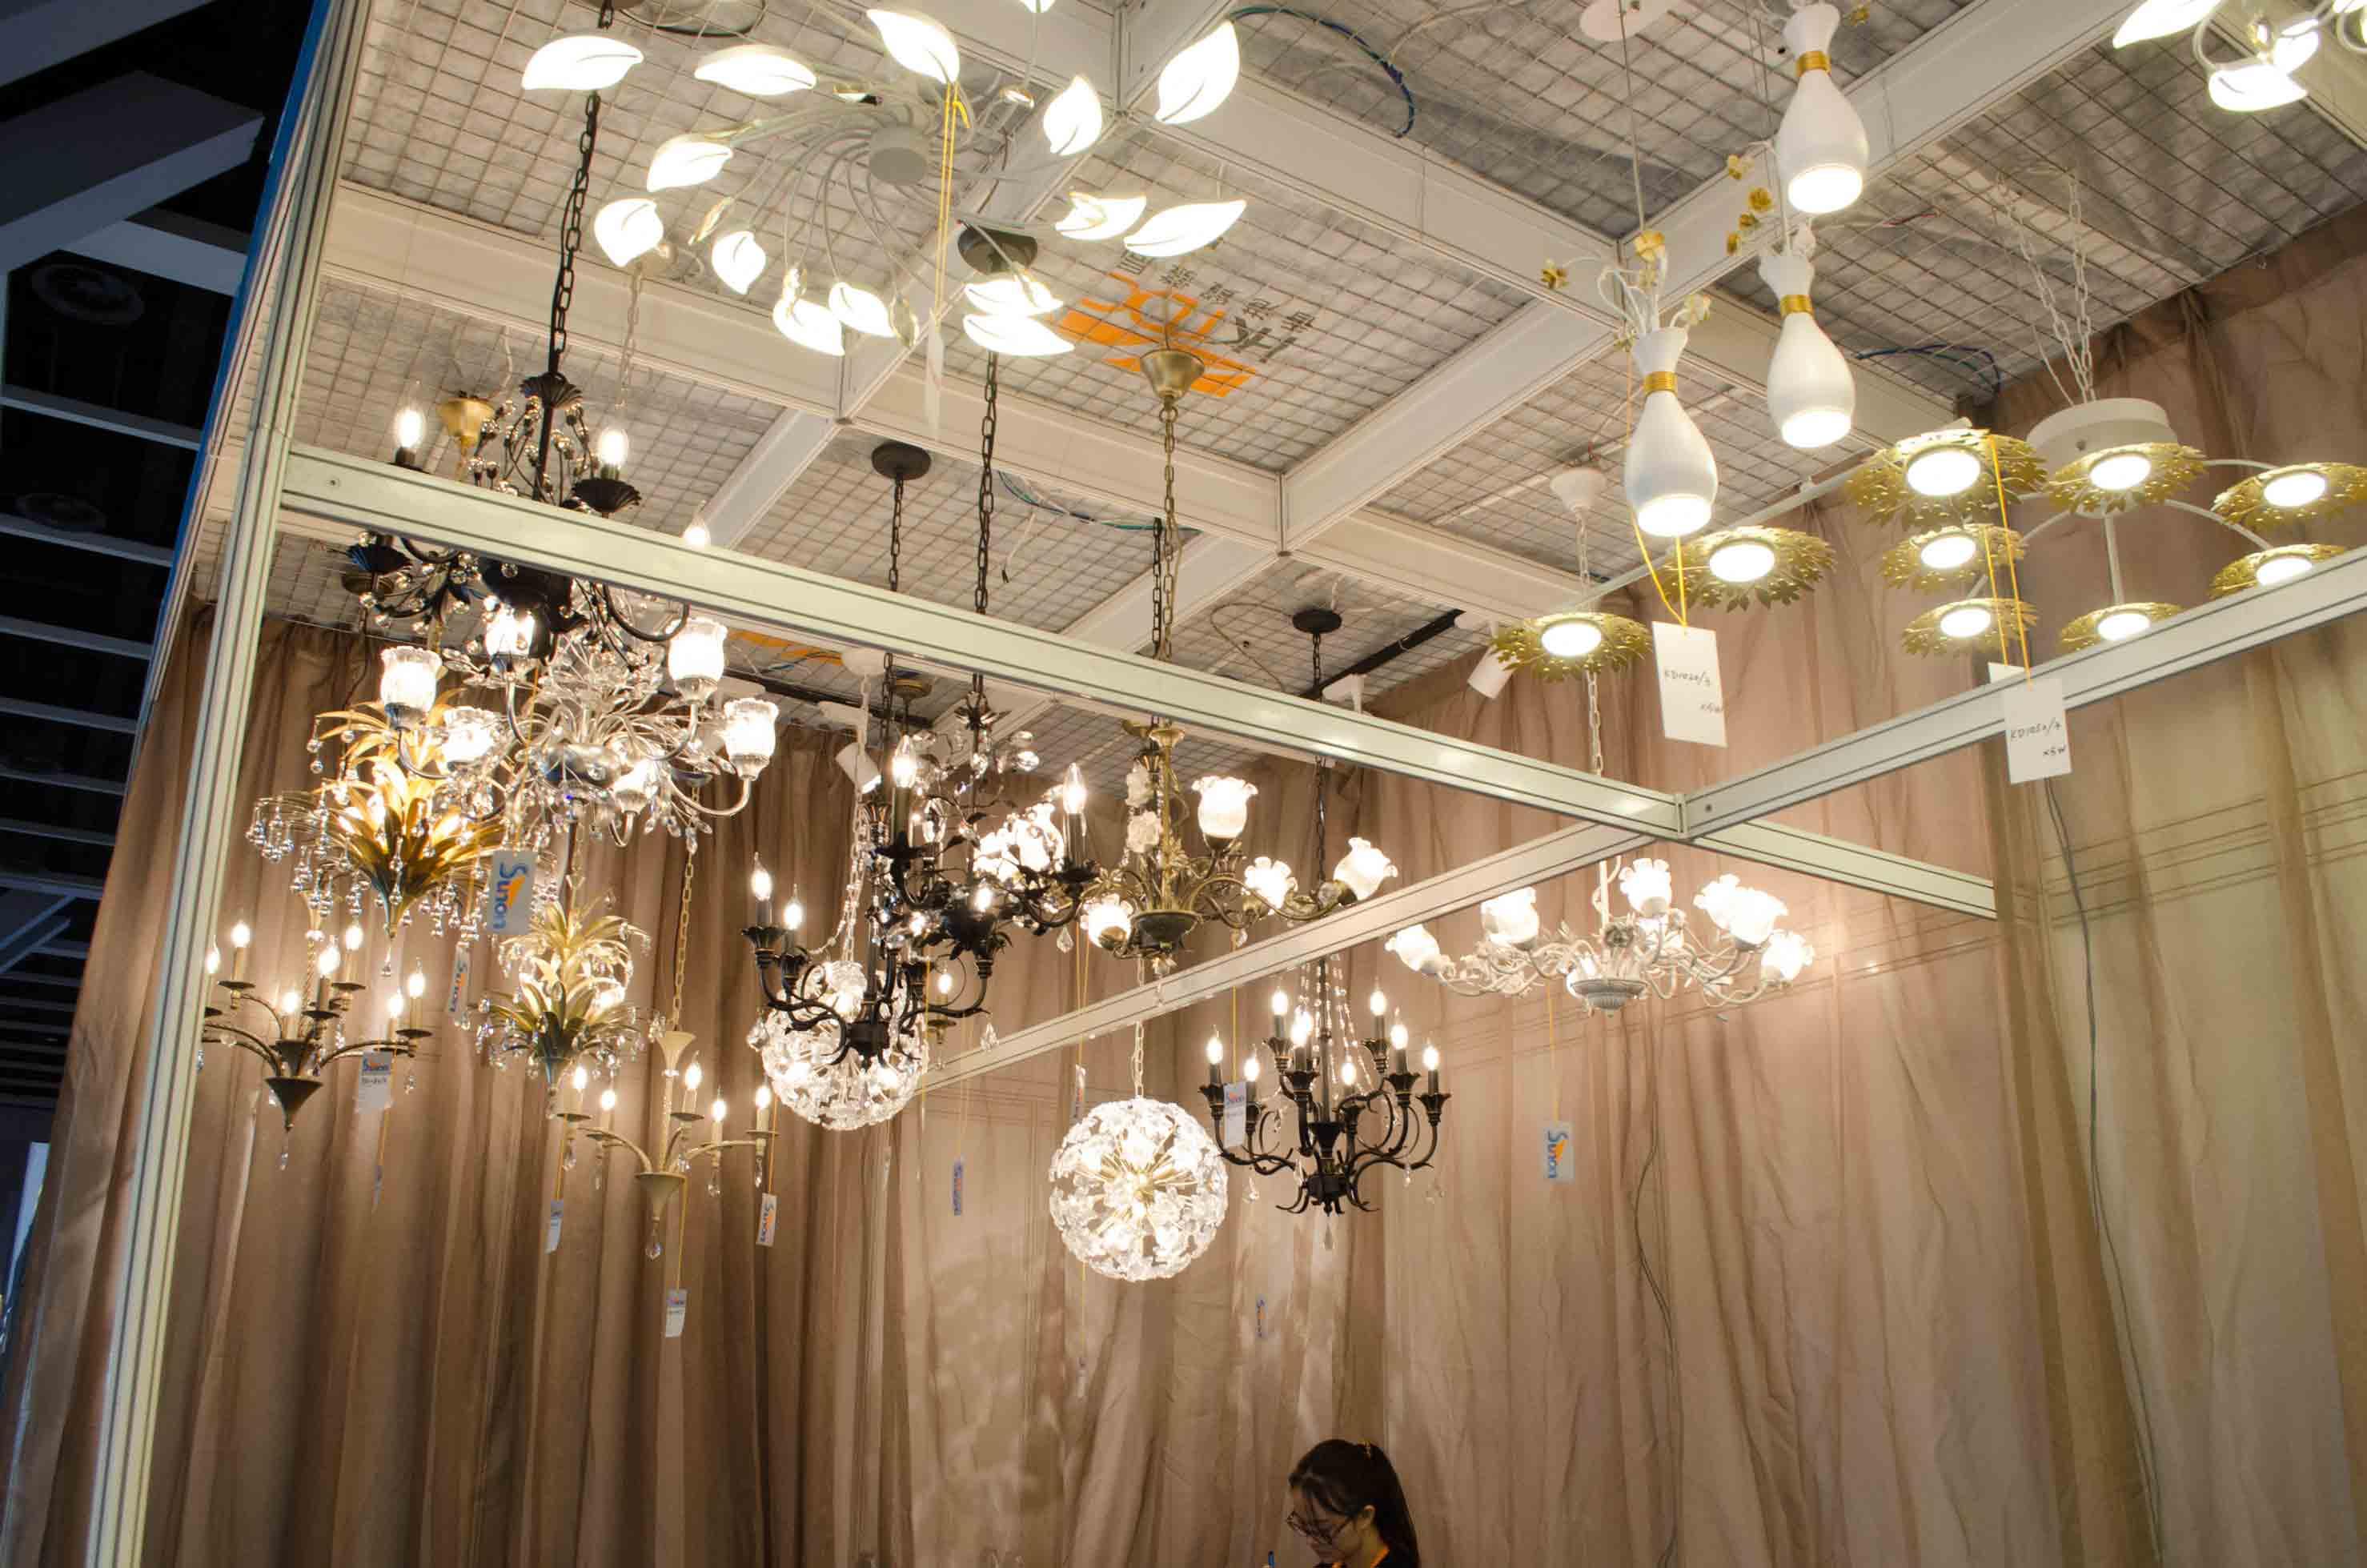 2016 HKTDC Hong Kong International Lighting Fair